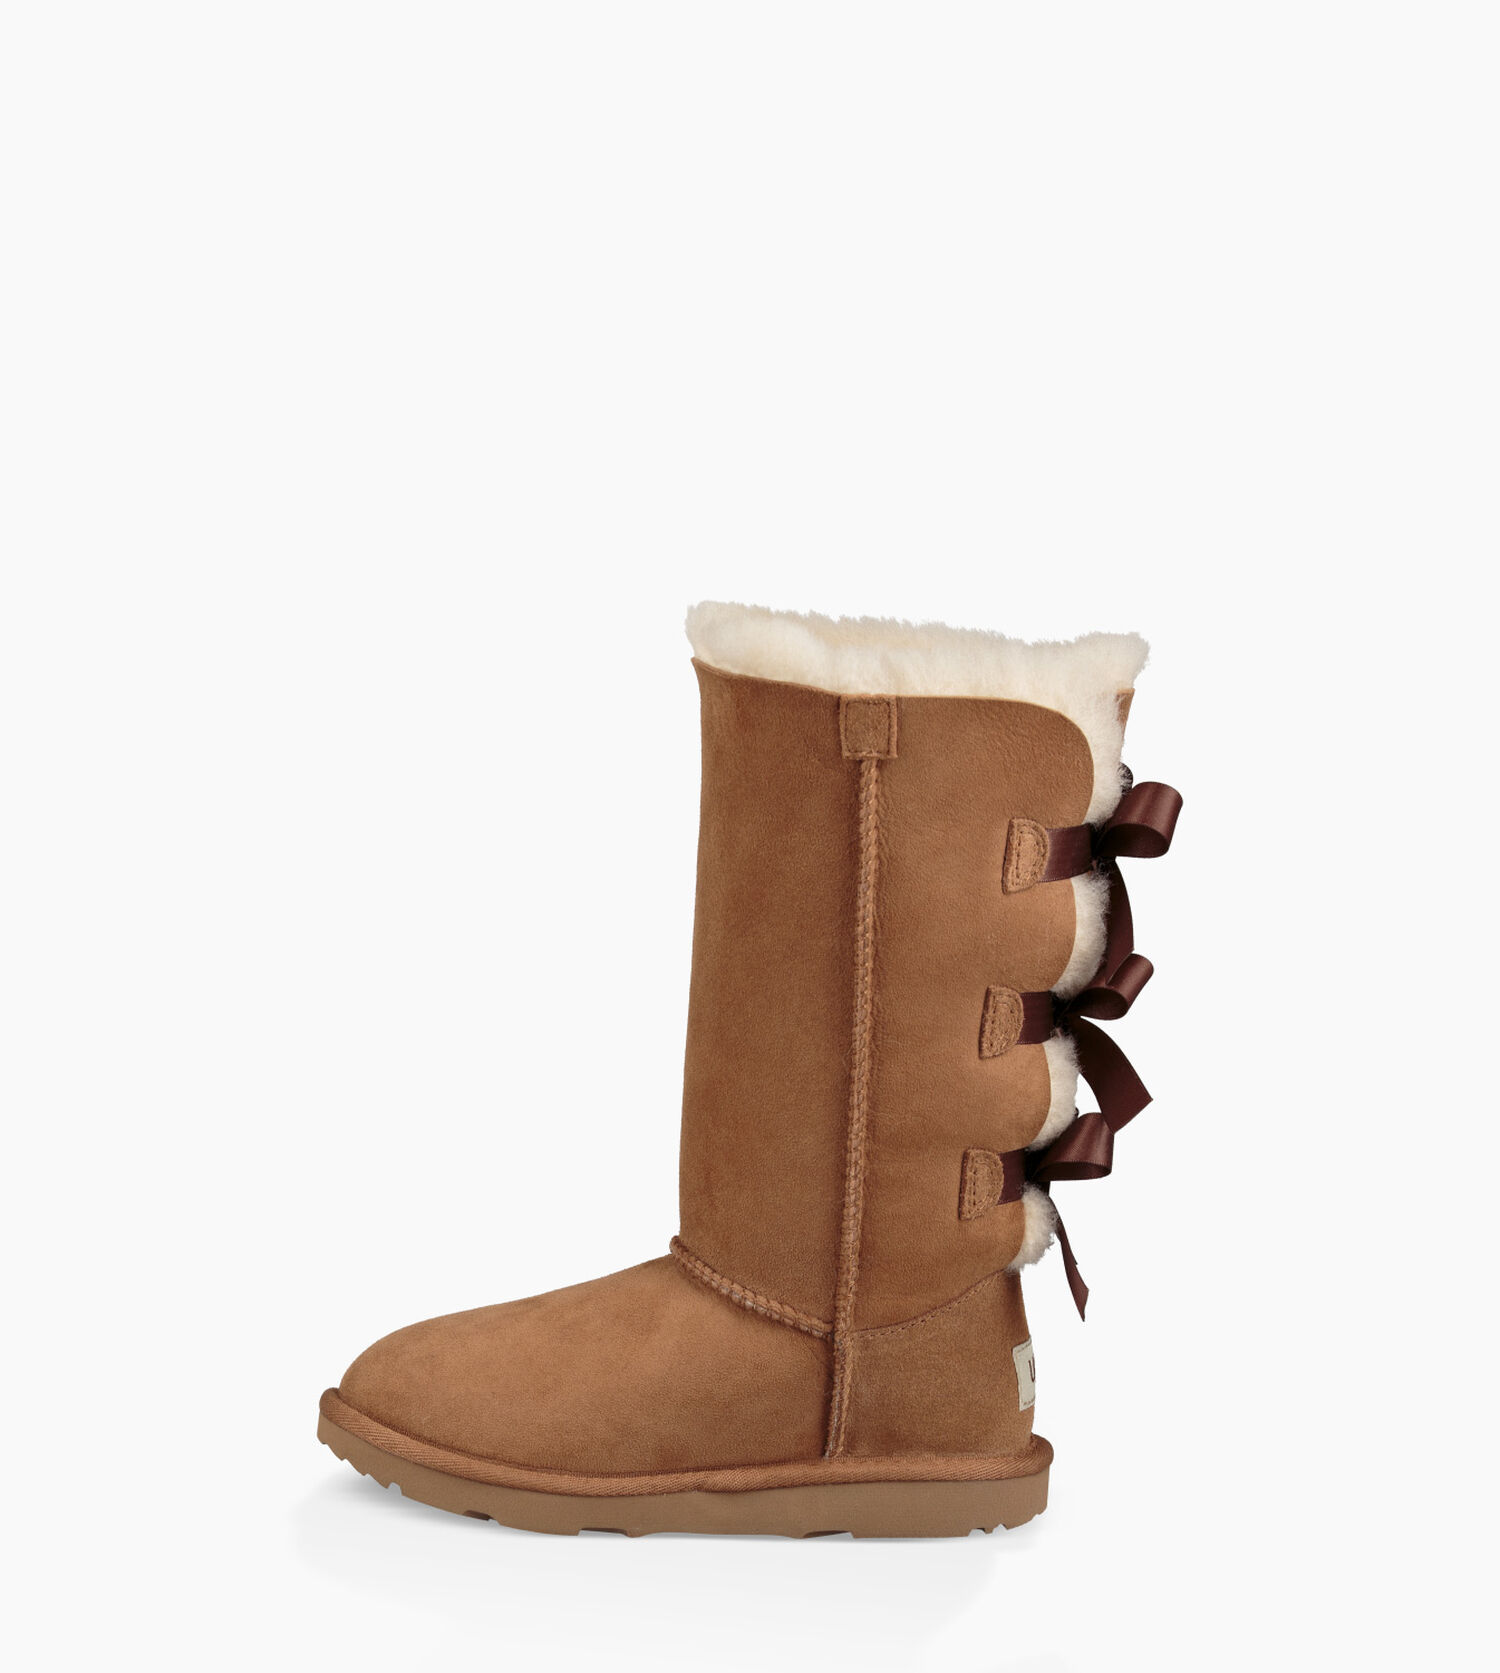 59baebdbfb5 Kids' Share this product Bailey Bow II Tall Boot